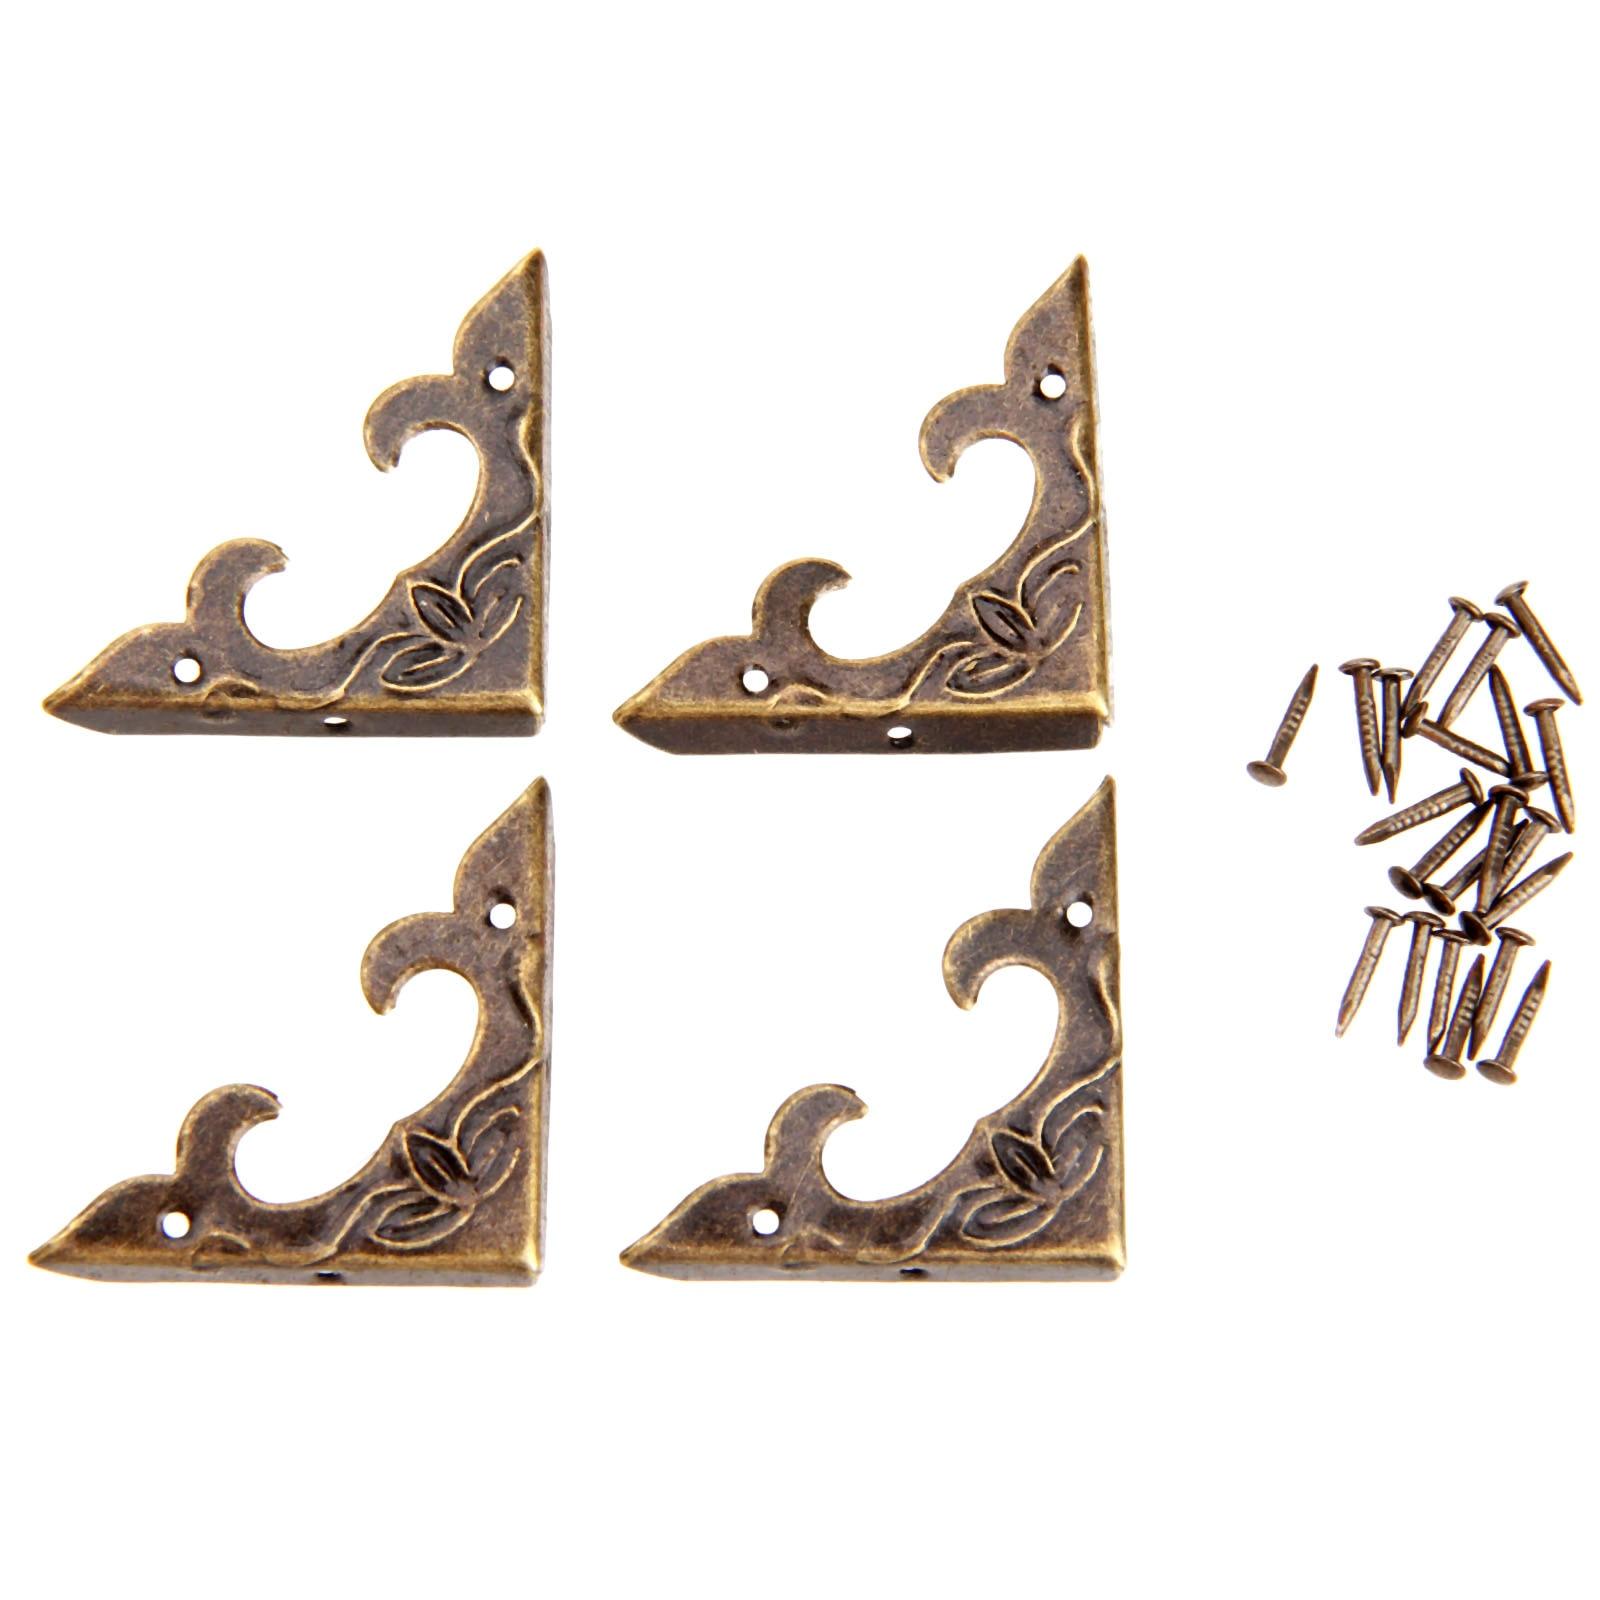 20Pc Antique Brass Furniture Corner Brackets Jewelry Gift Box Wood Case Decorative Feet Leg Metal Corner Protector For Furniture